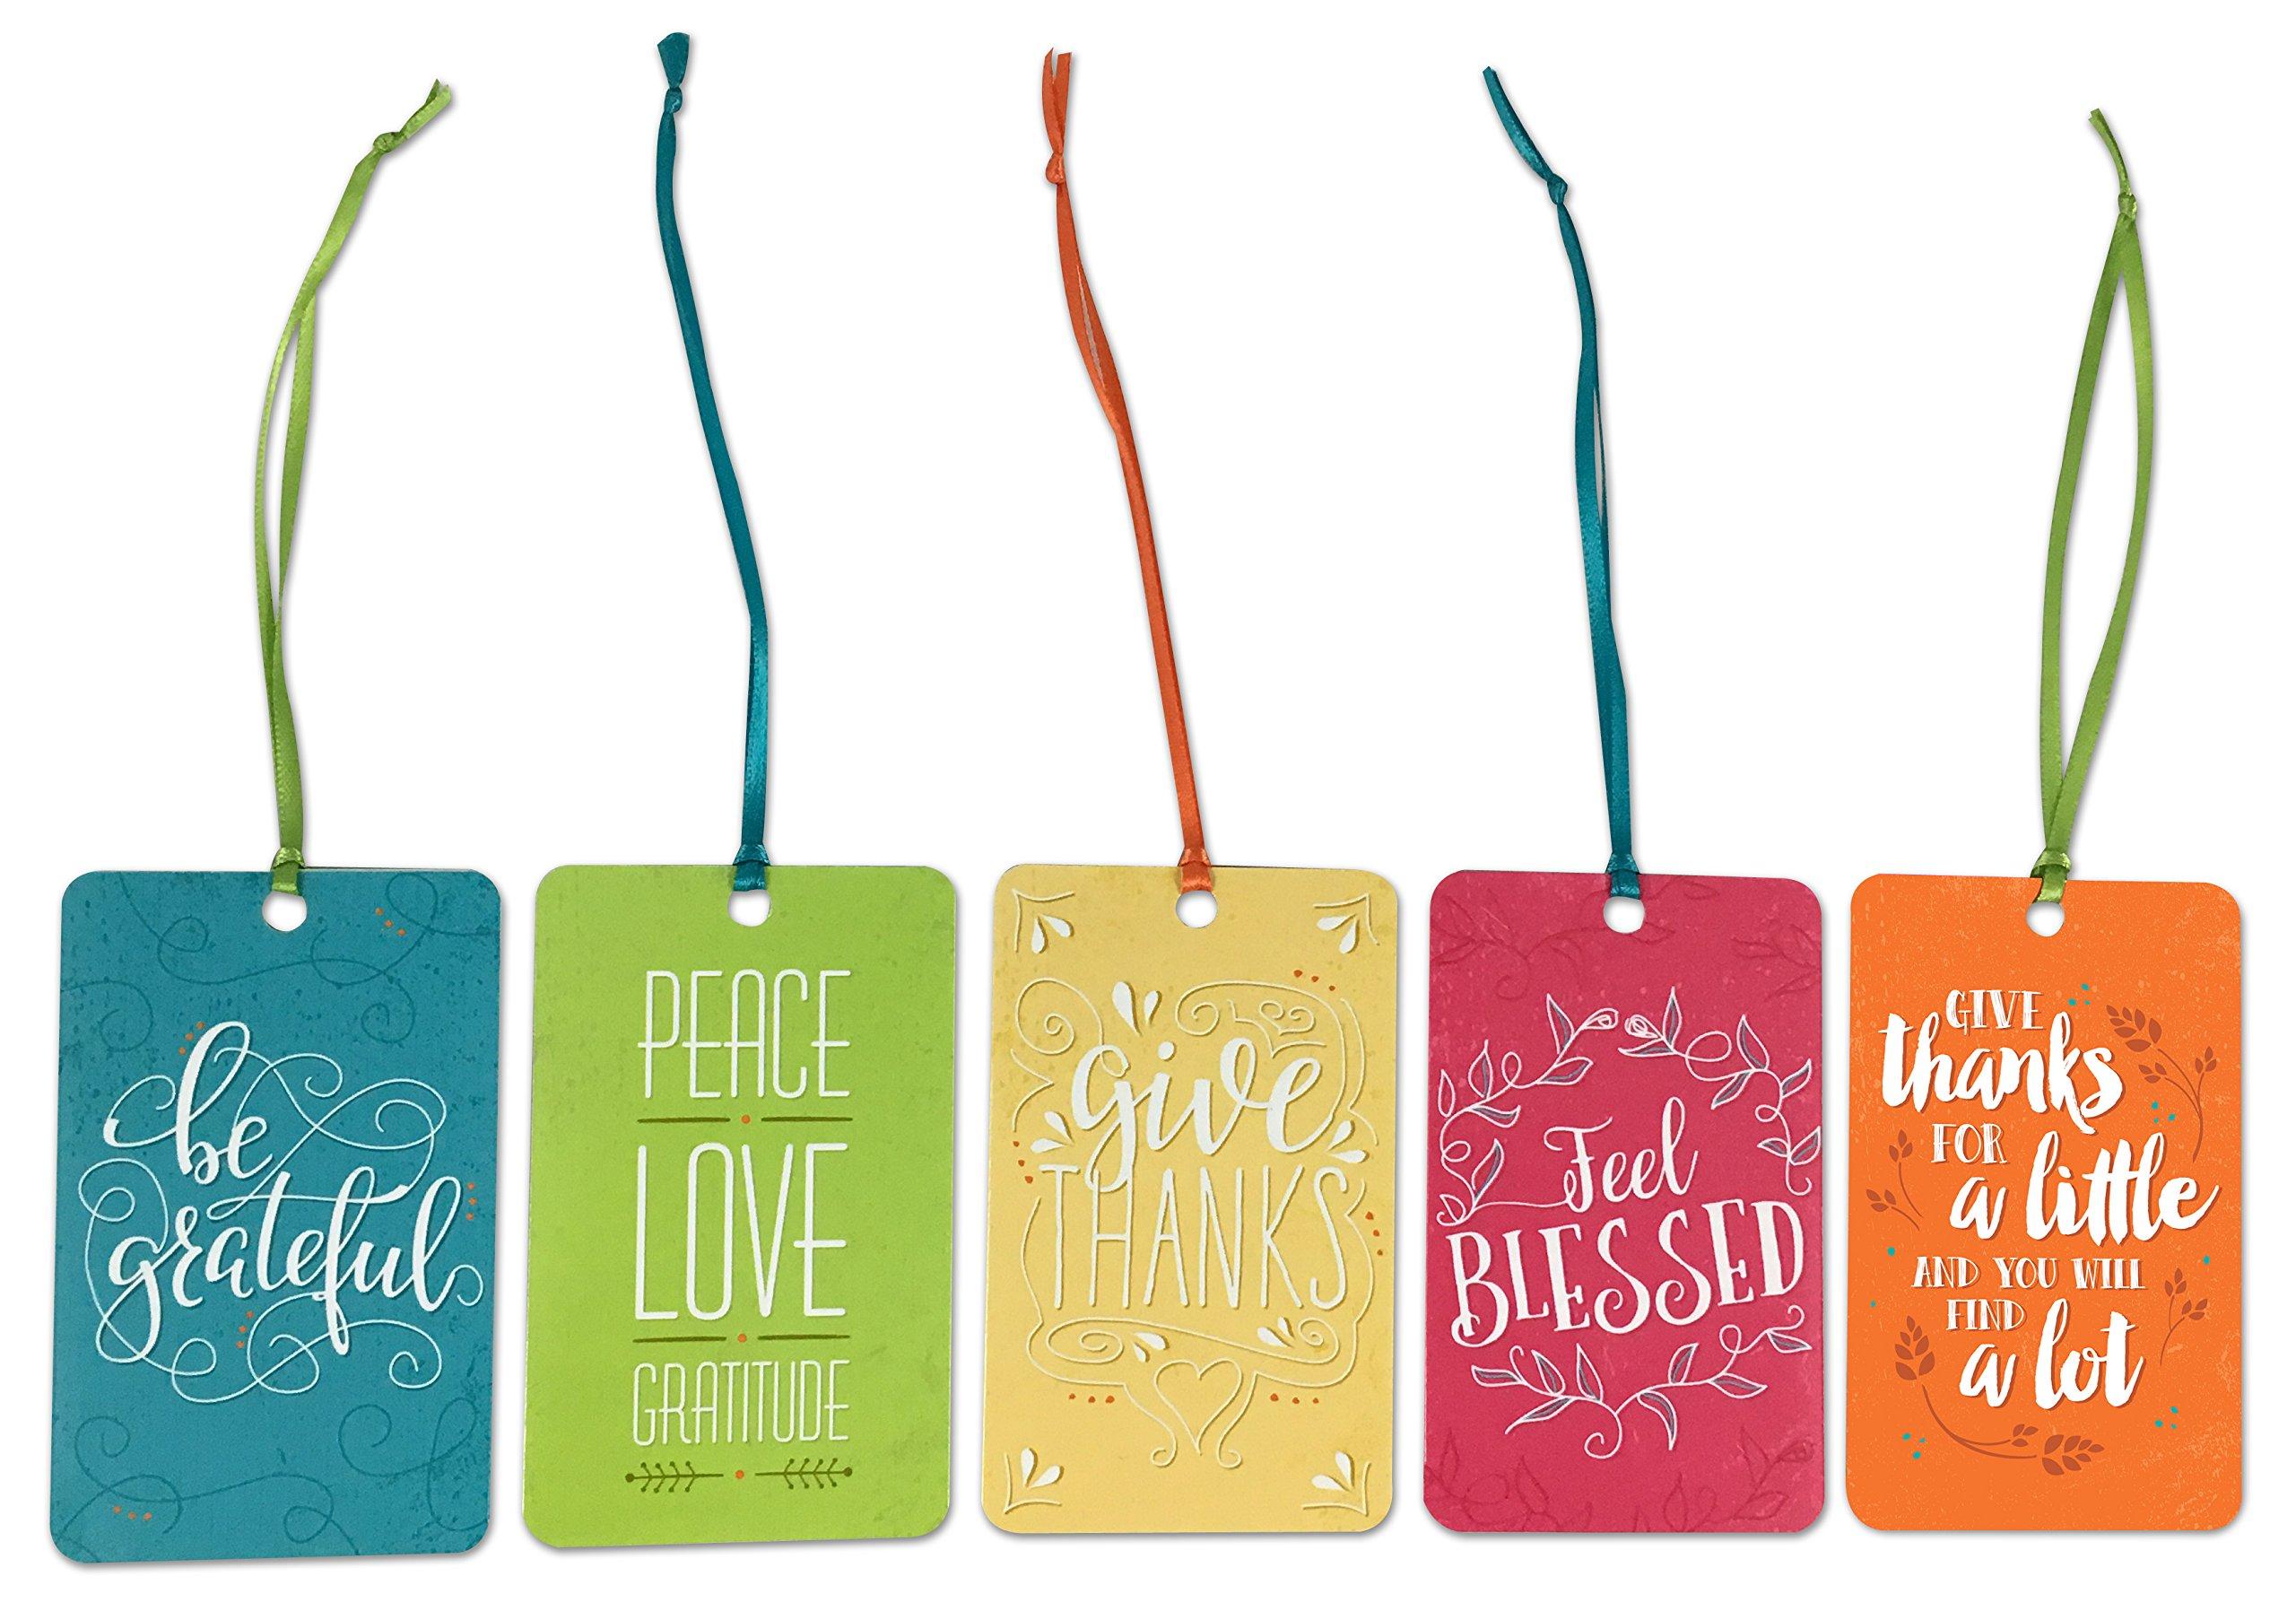 Lunchbox Love Gratitude Tree Notes